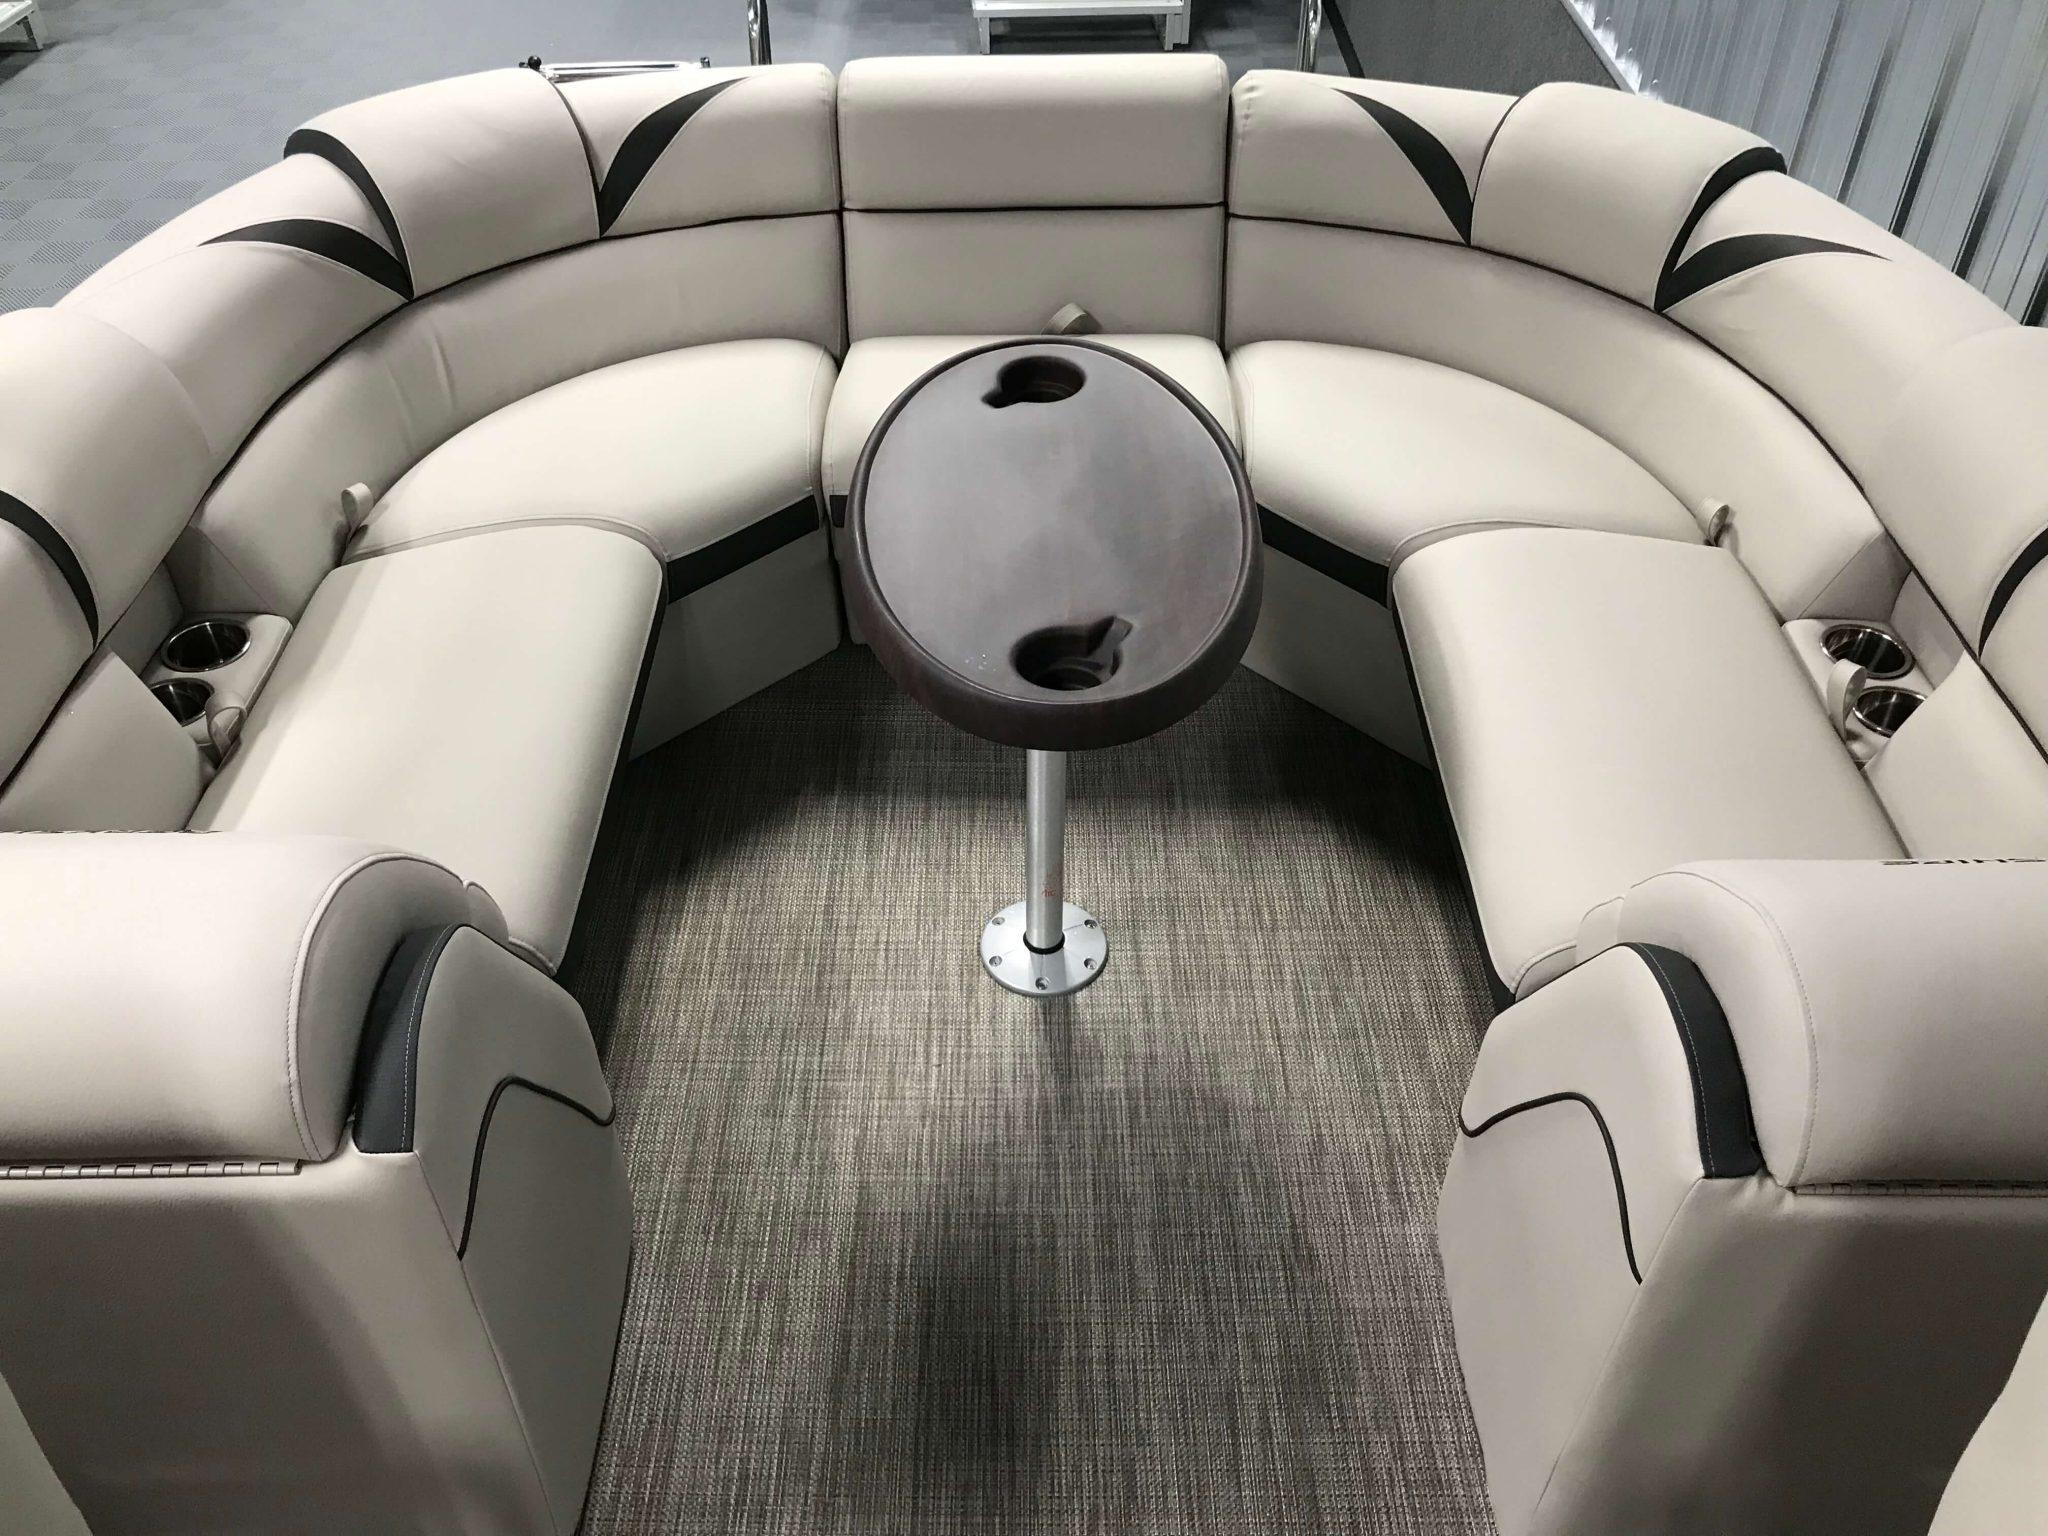 2019 Berkshire 23RFX STS Deluxe Interior Cockpit Layout 3